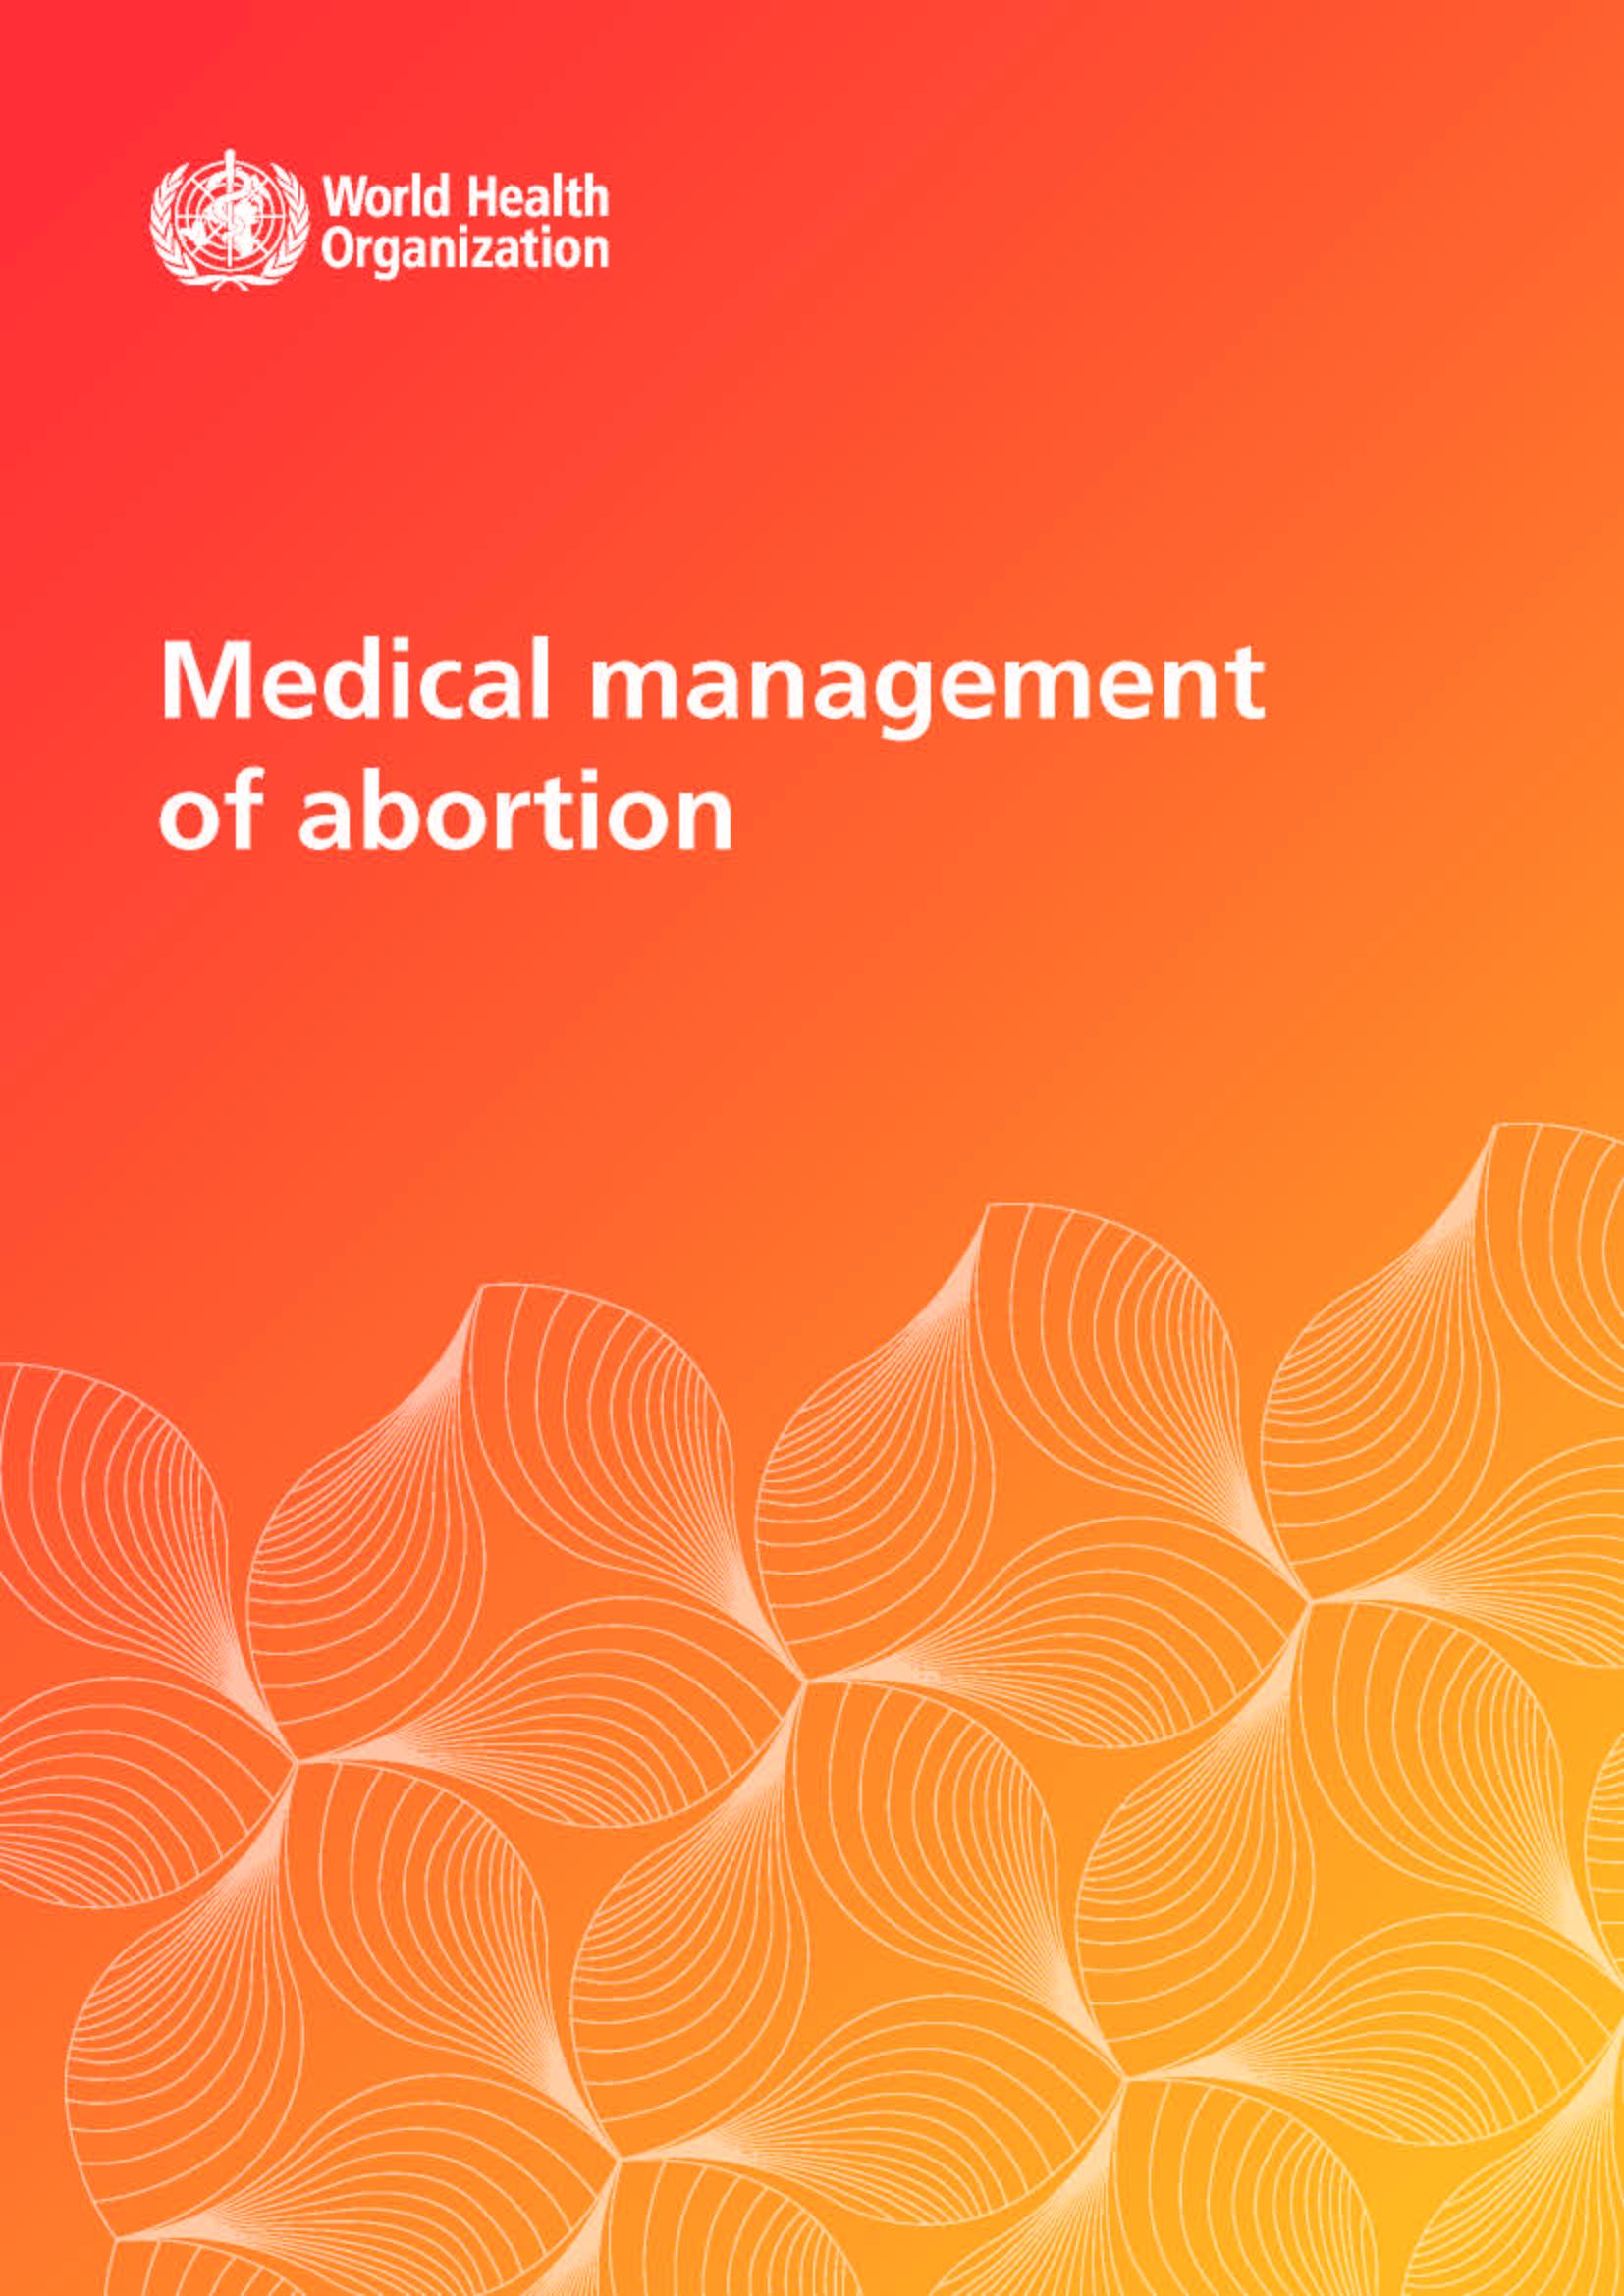 Medical management of abortion